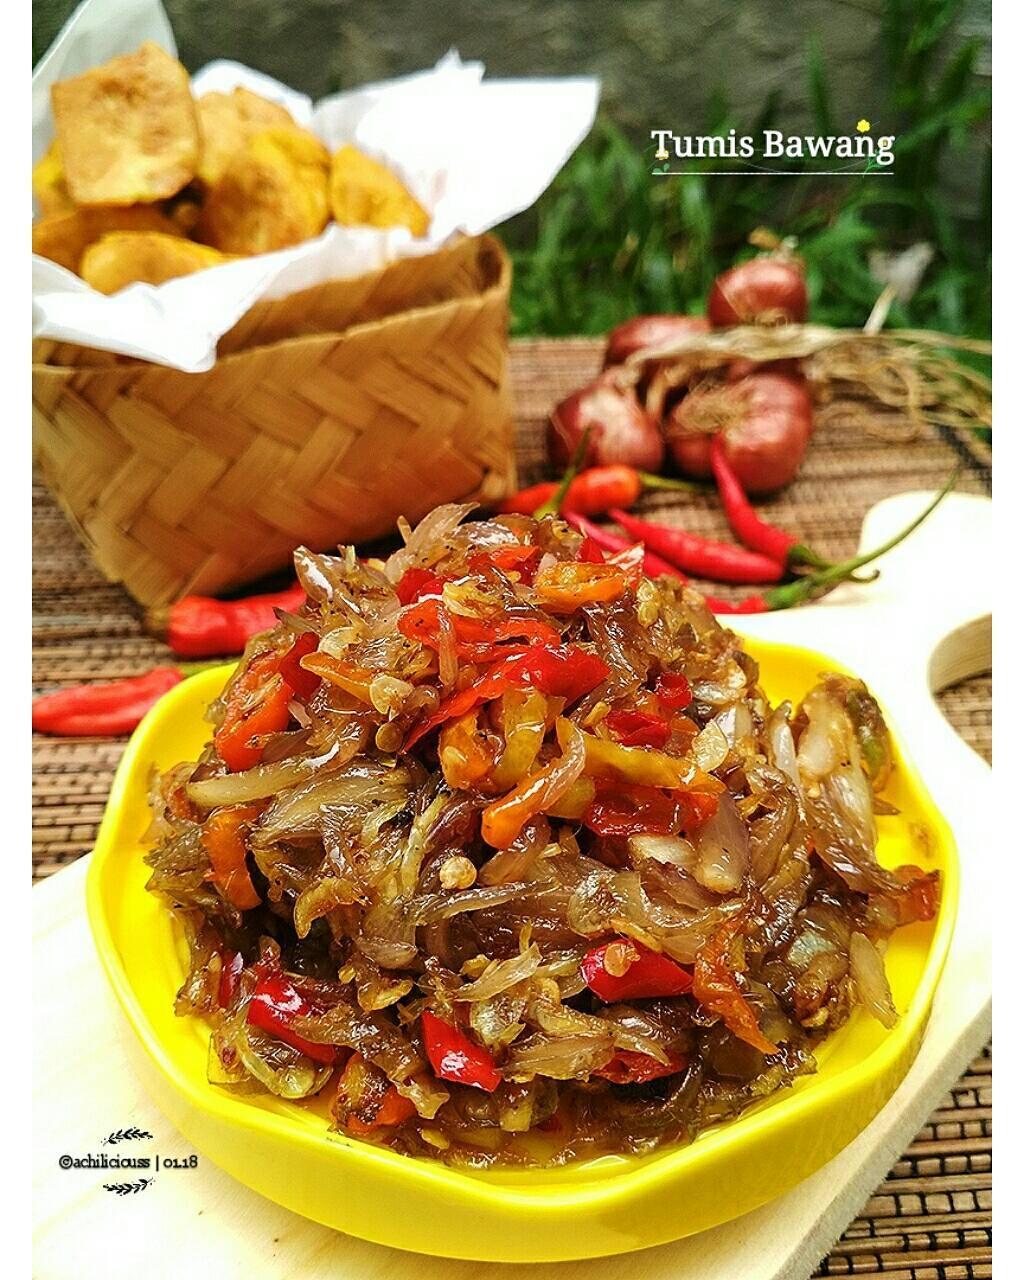 Ide Resep Masak Tumis Bawang Udang Rebon